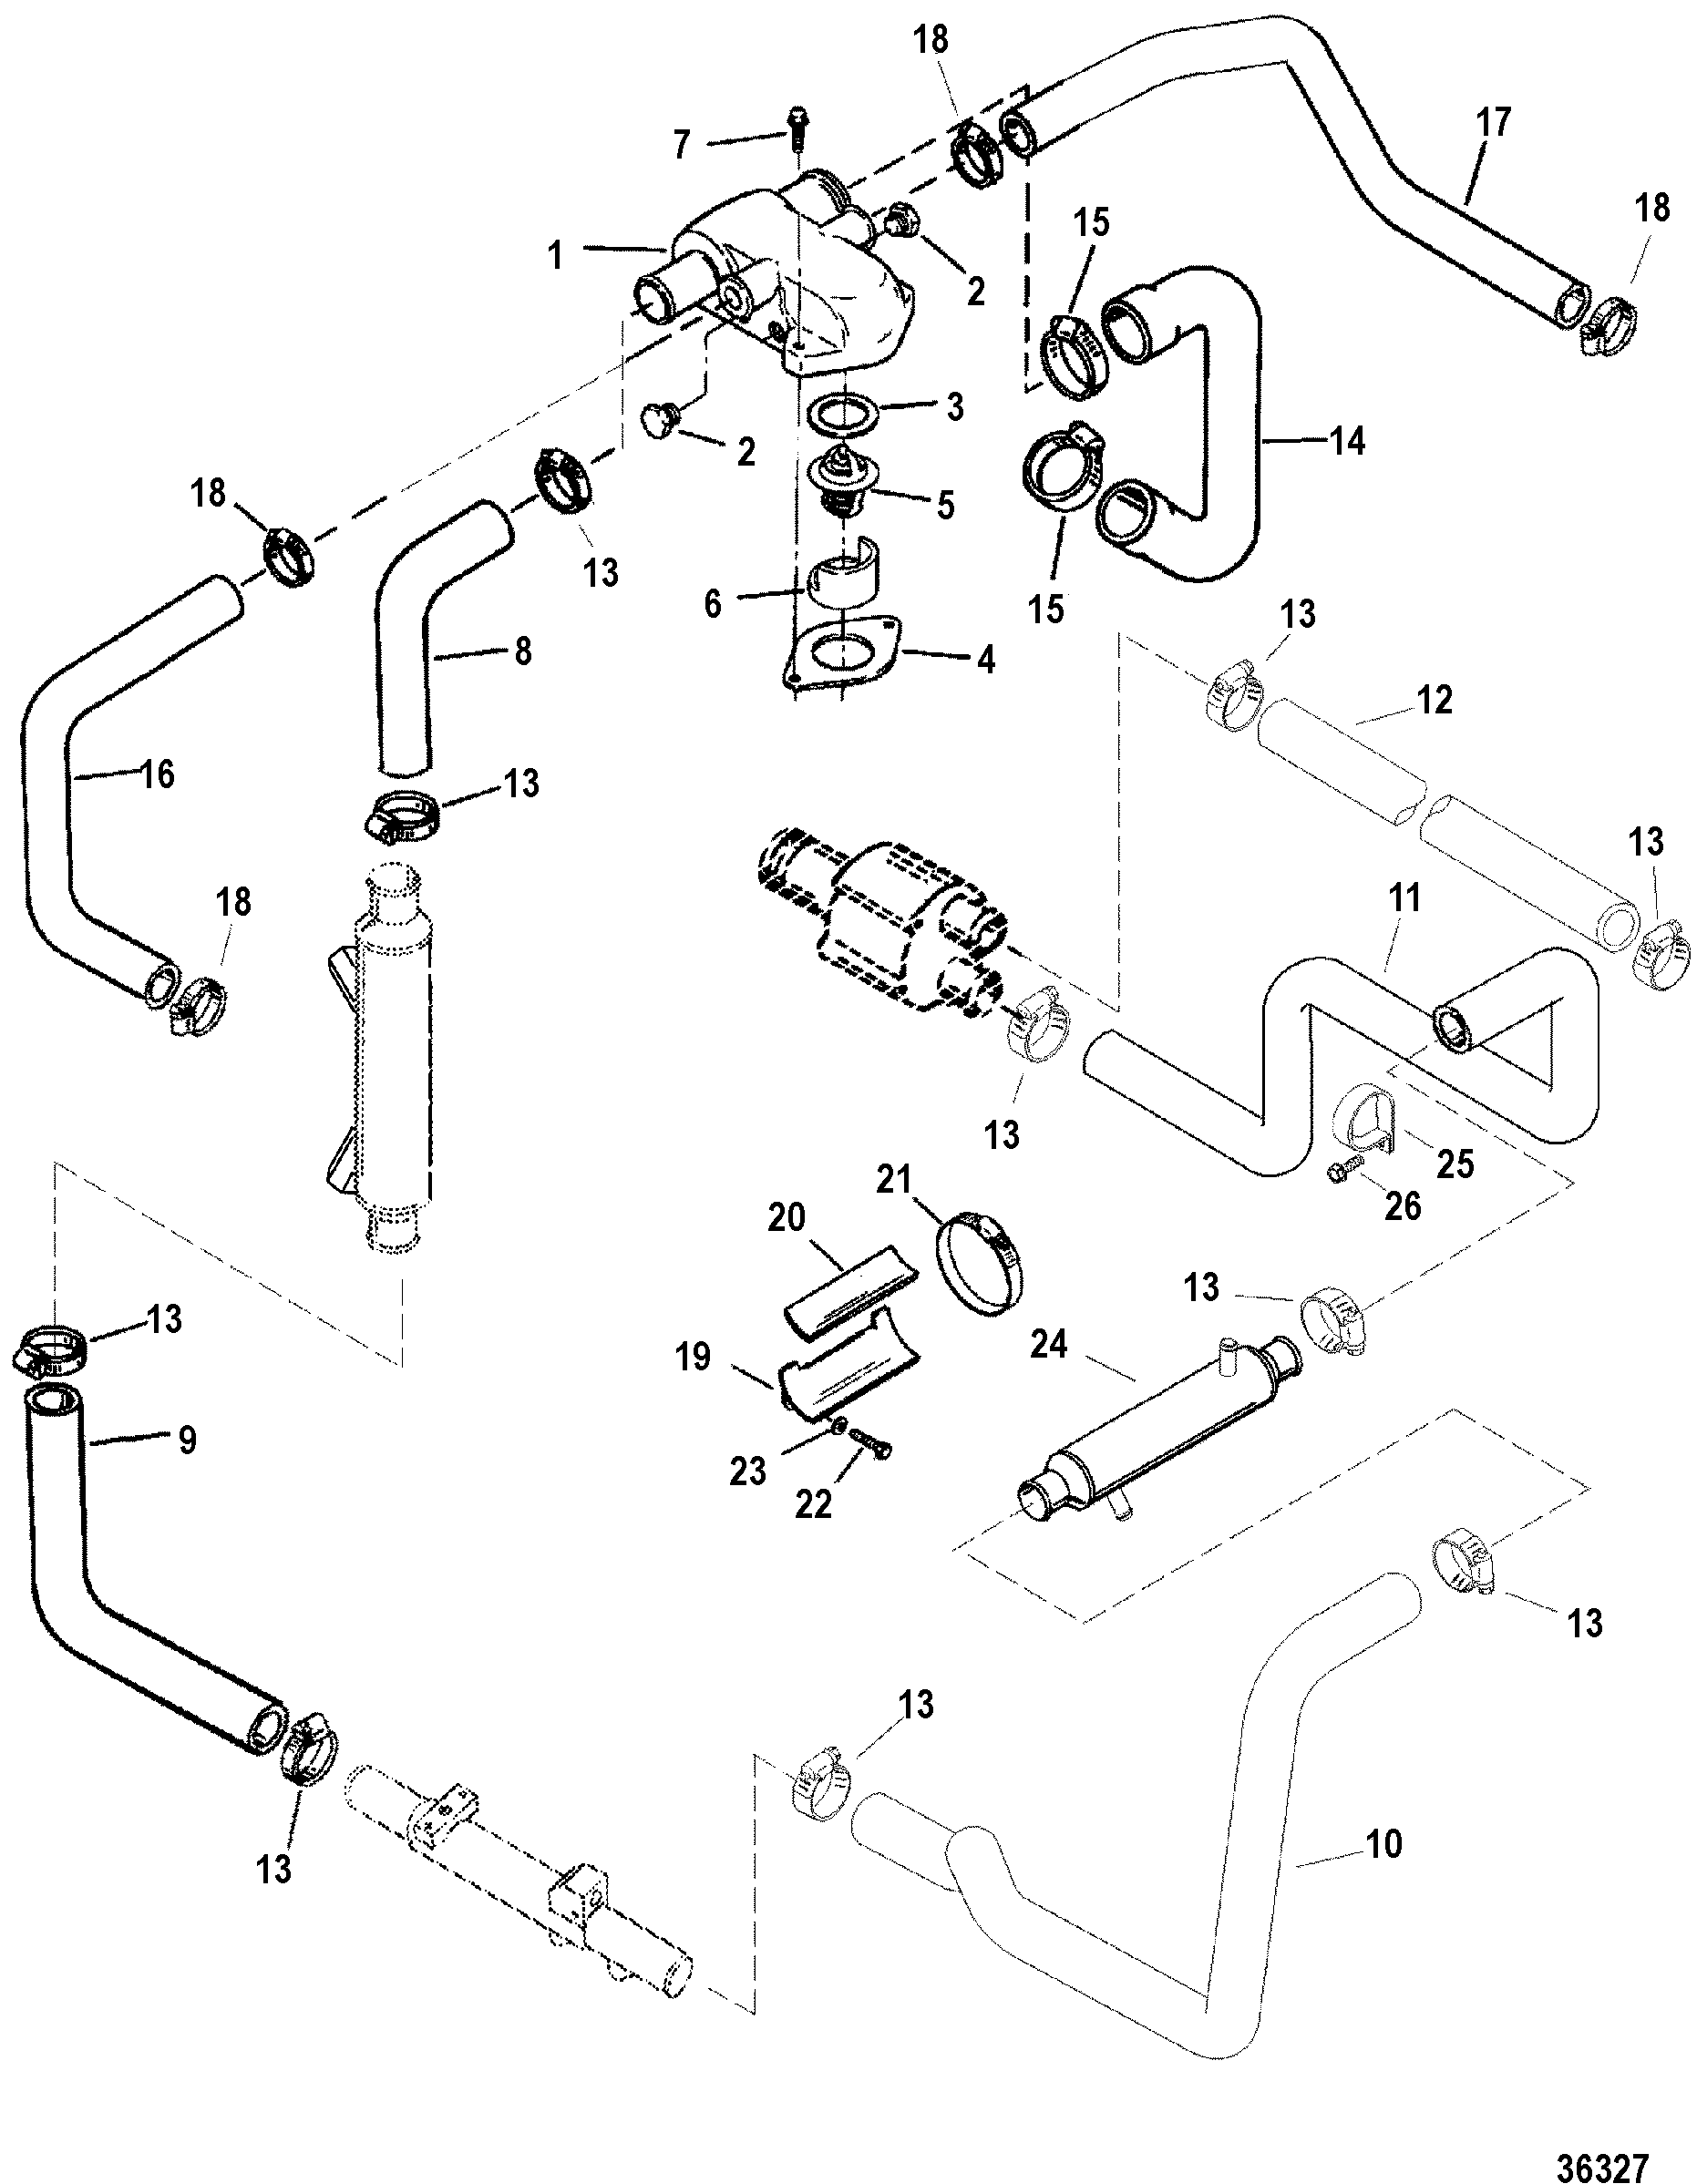 2014 chevy cruze parts diagram